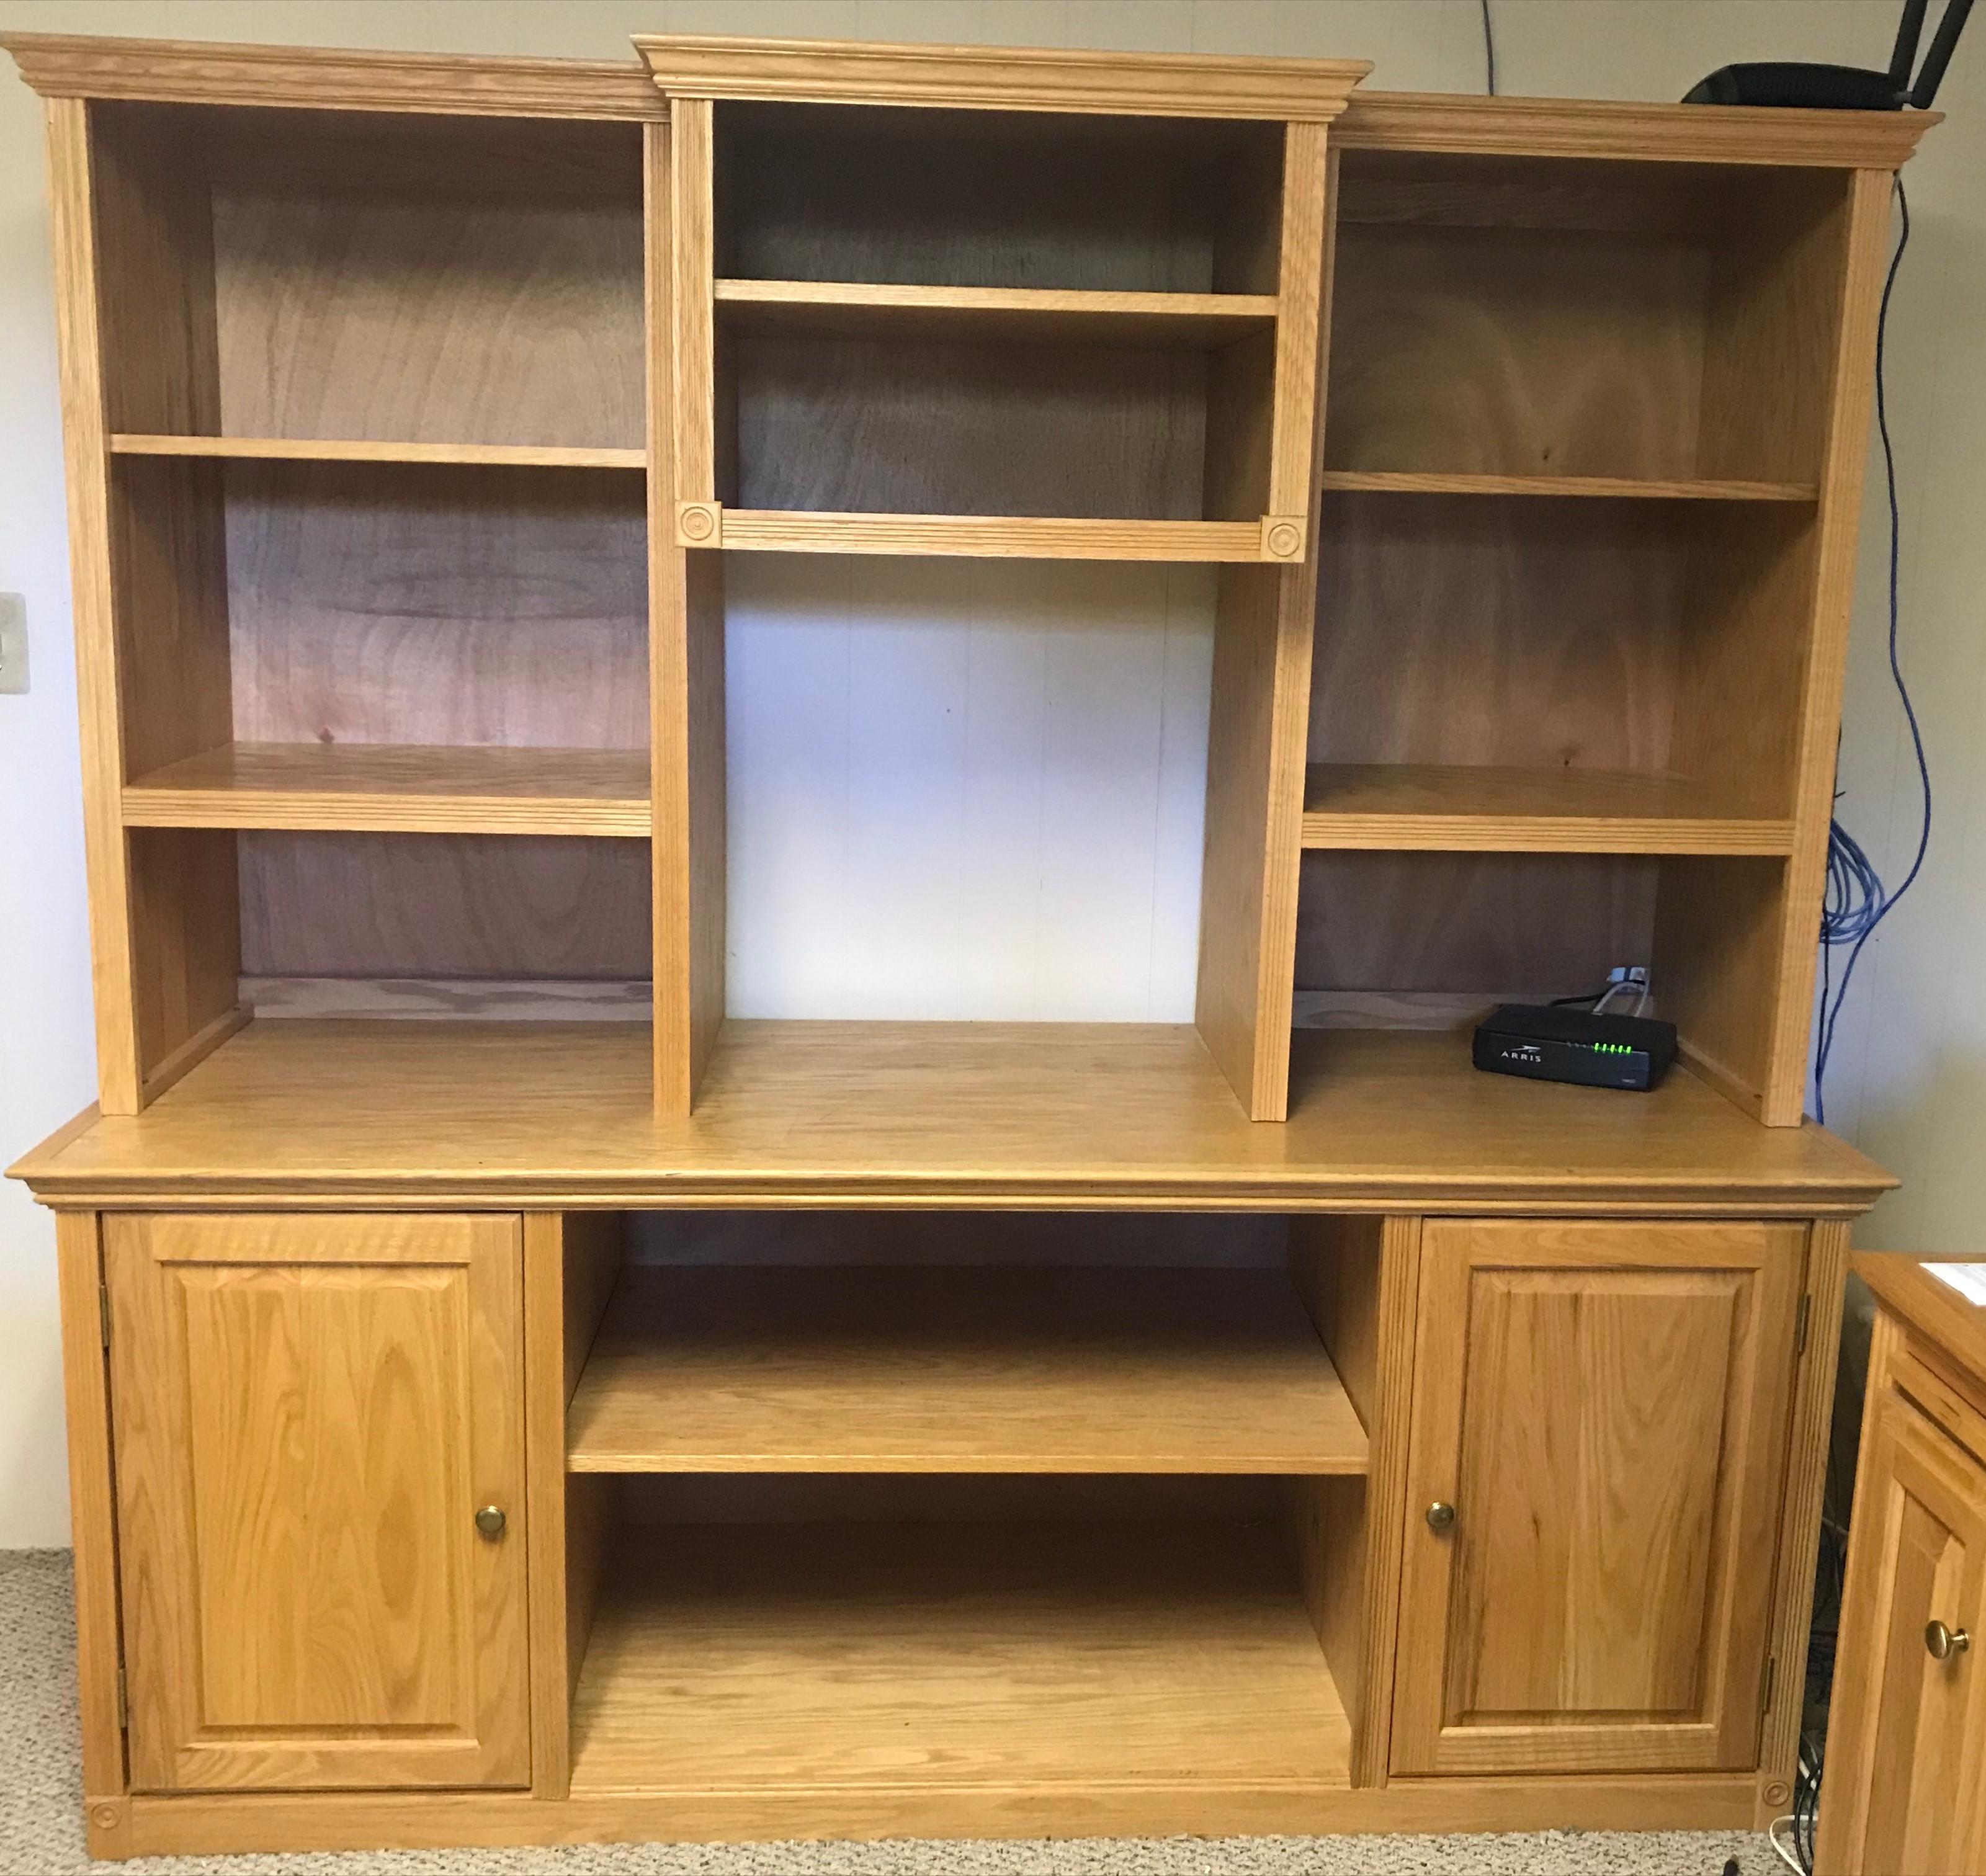 3-Piece Wood Bookcase in Oak Finish